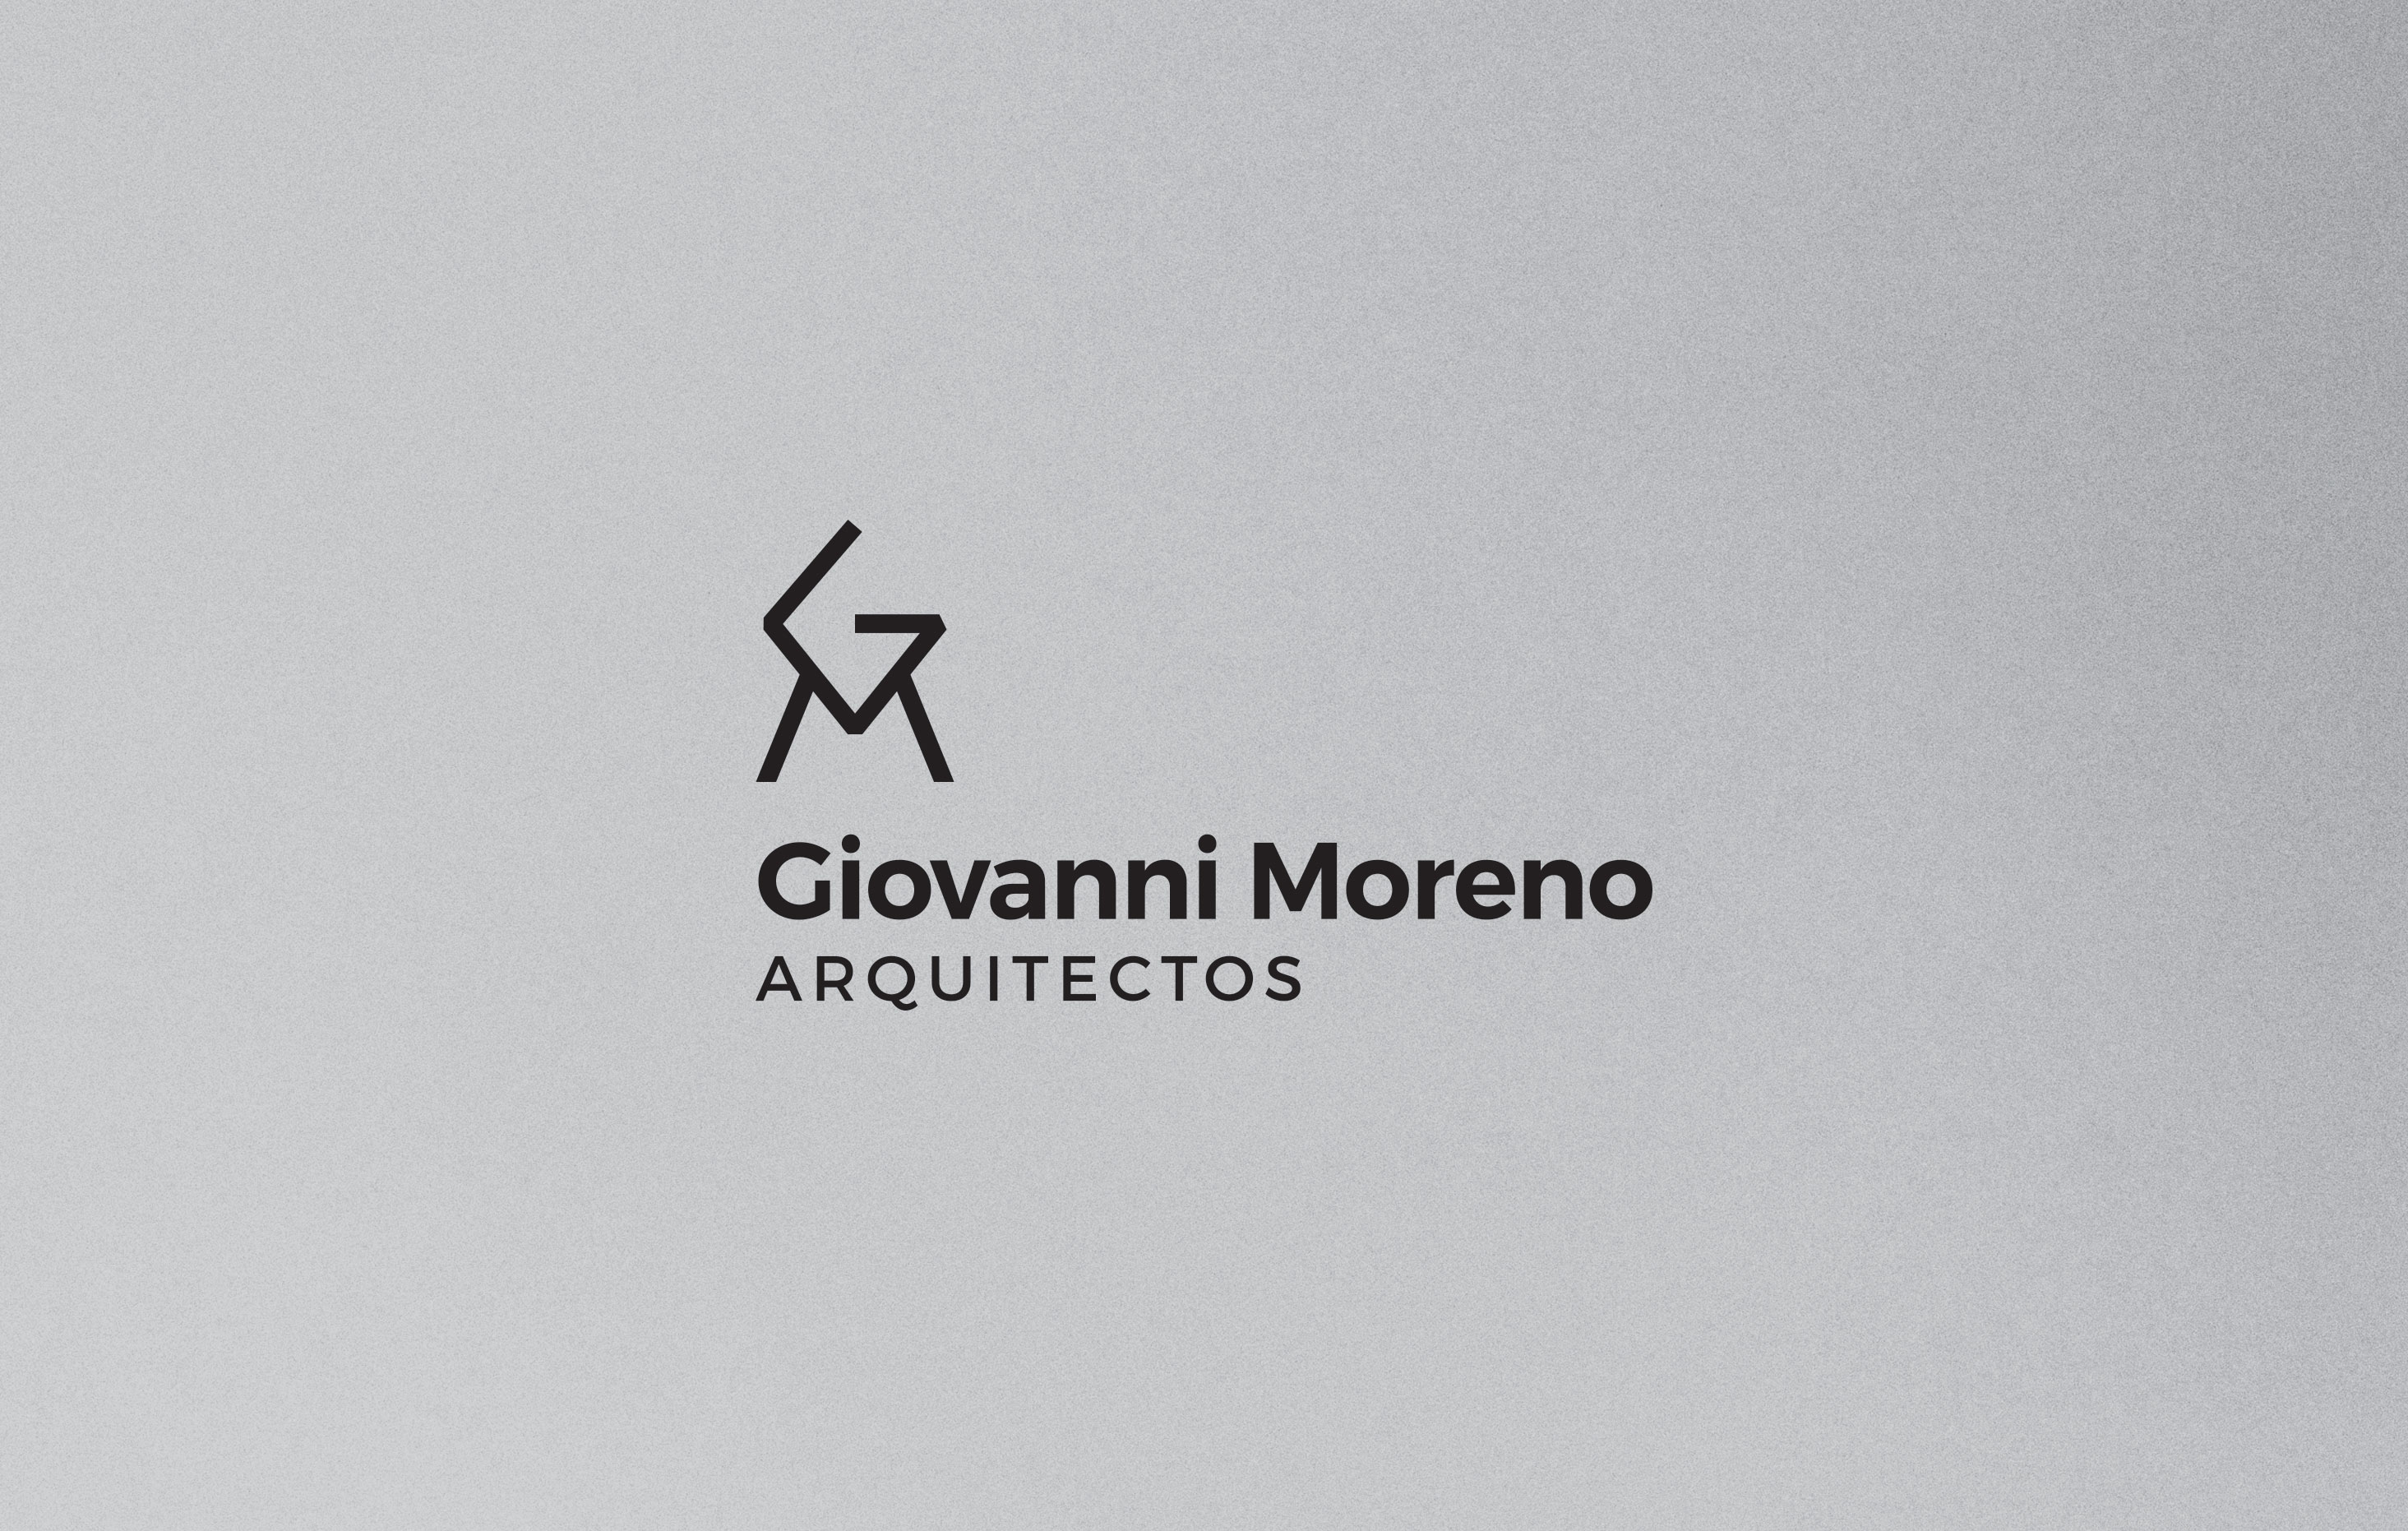 GIOVANNI-MORENO-LOGO-01